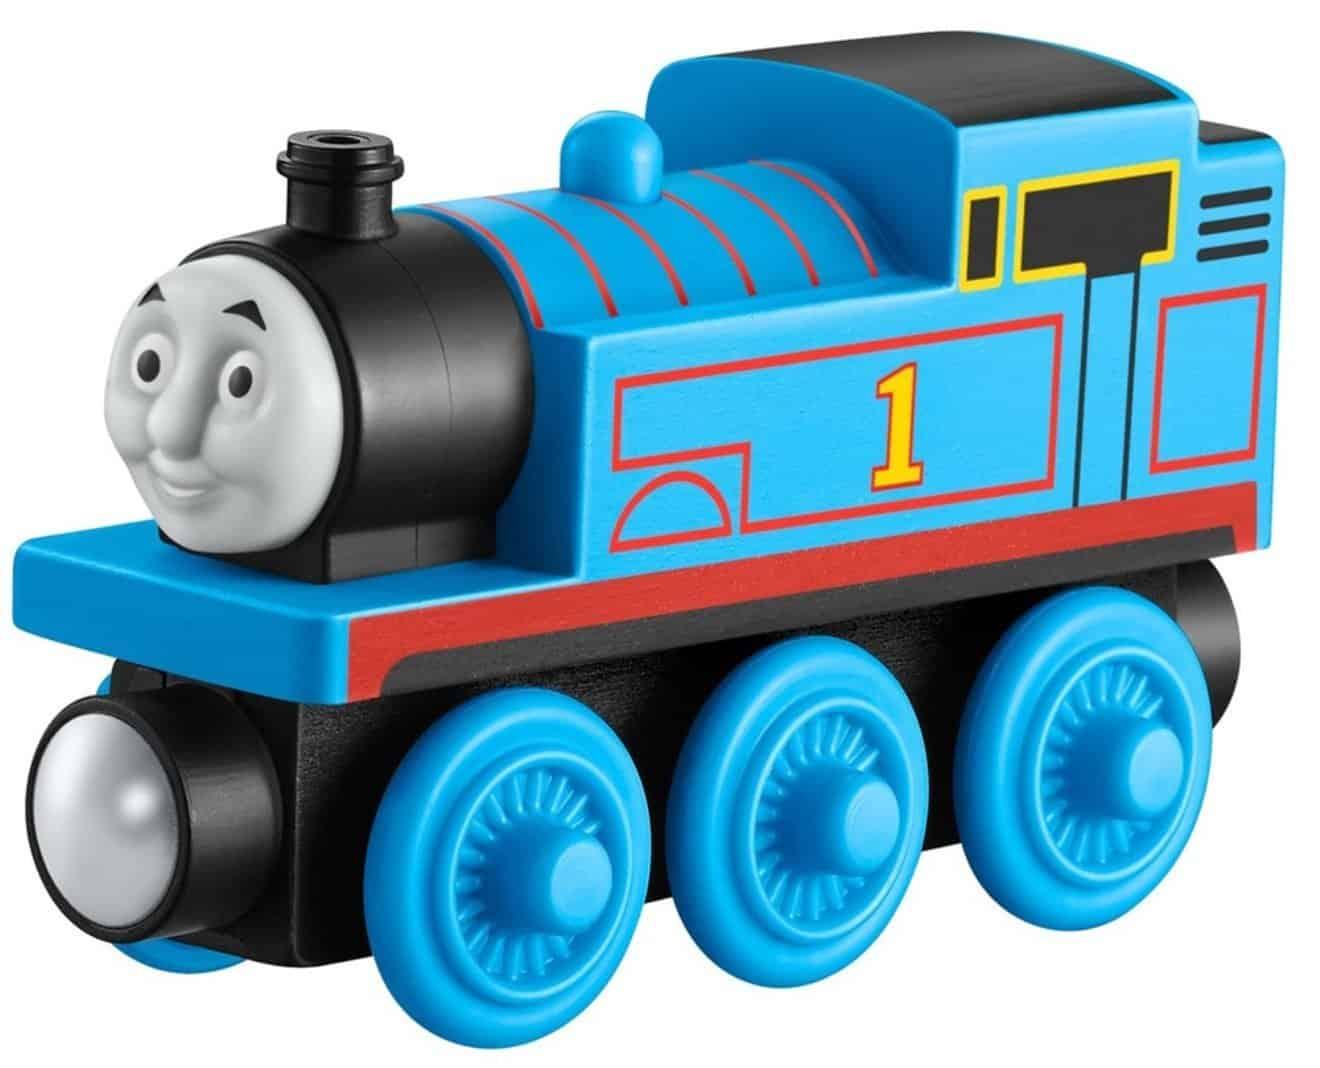 thomas the tank engine wooden train set instructions